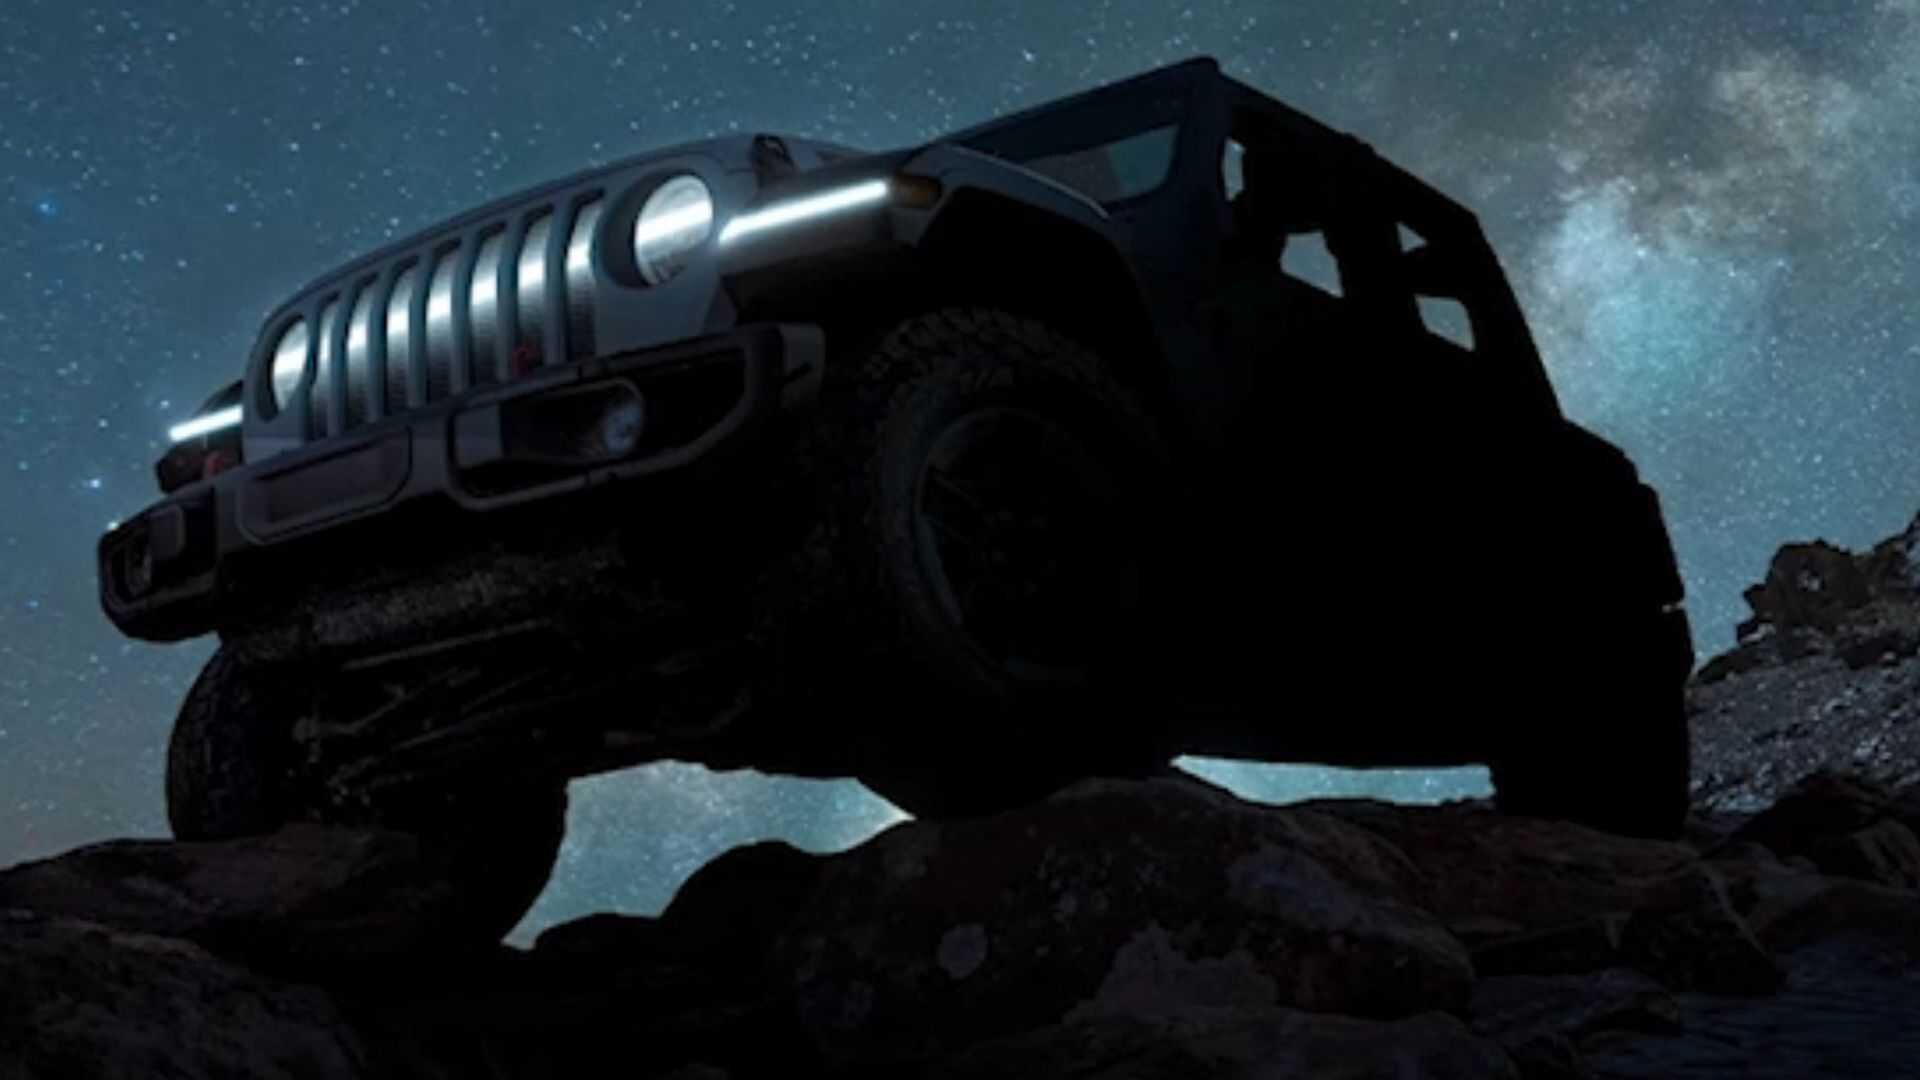 Jeep Wrangler SUV'nin elektrikli versiyonunu duyurdu